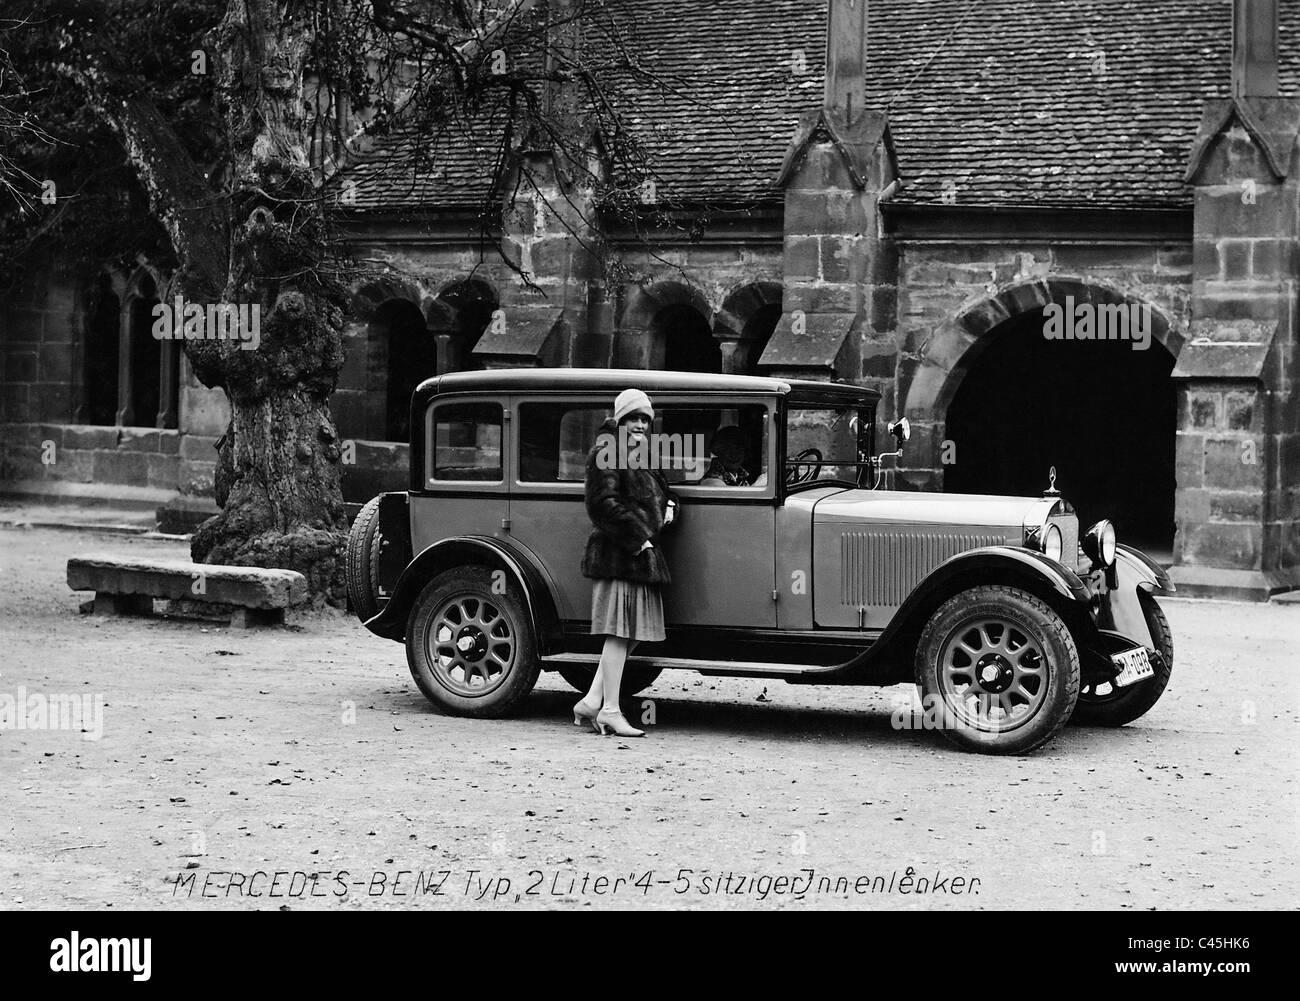 Mercedes-Benz '2 liters' version, 1928 - Stock Image